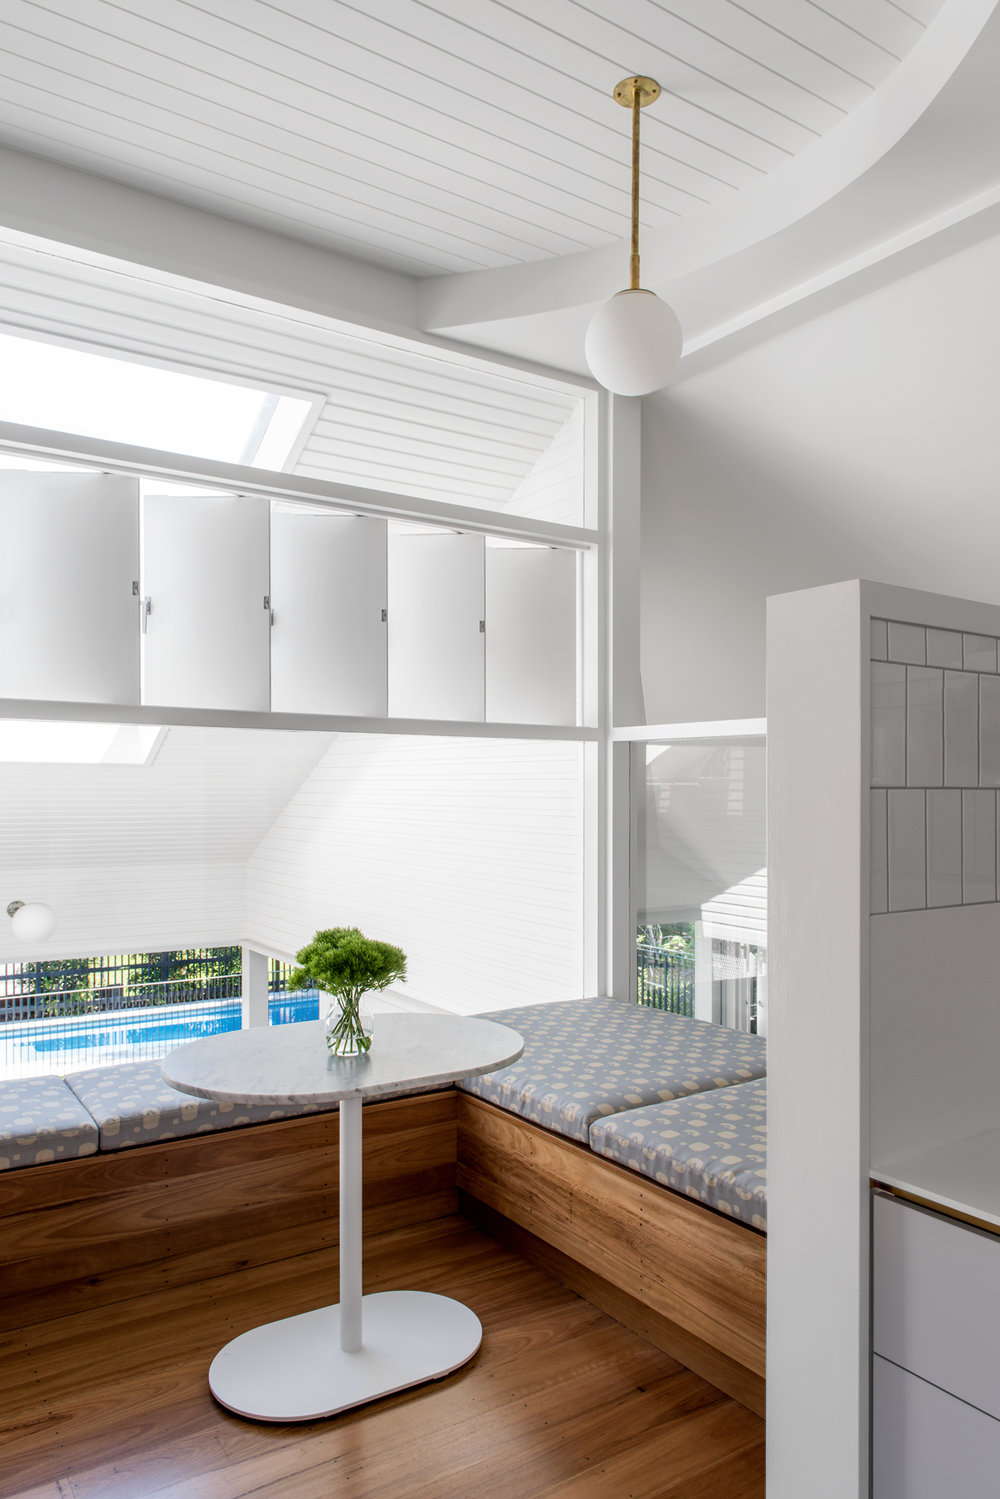 georgia-cannon-interior-designer-brisbane-rawson-house_15_S.jpg